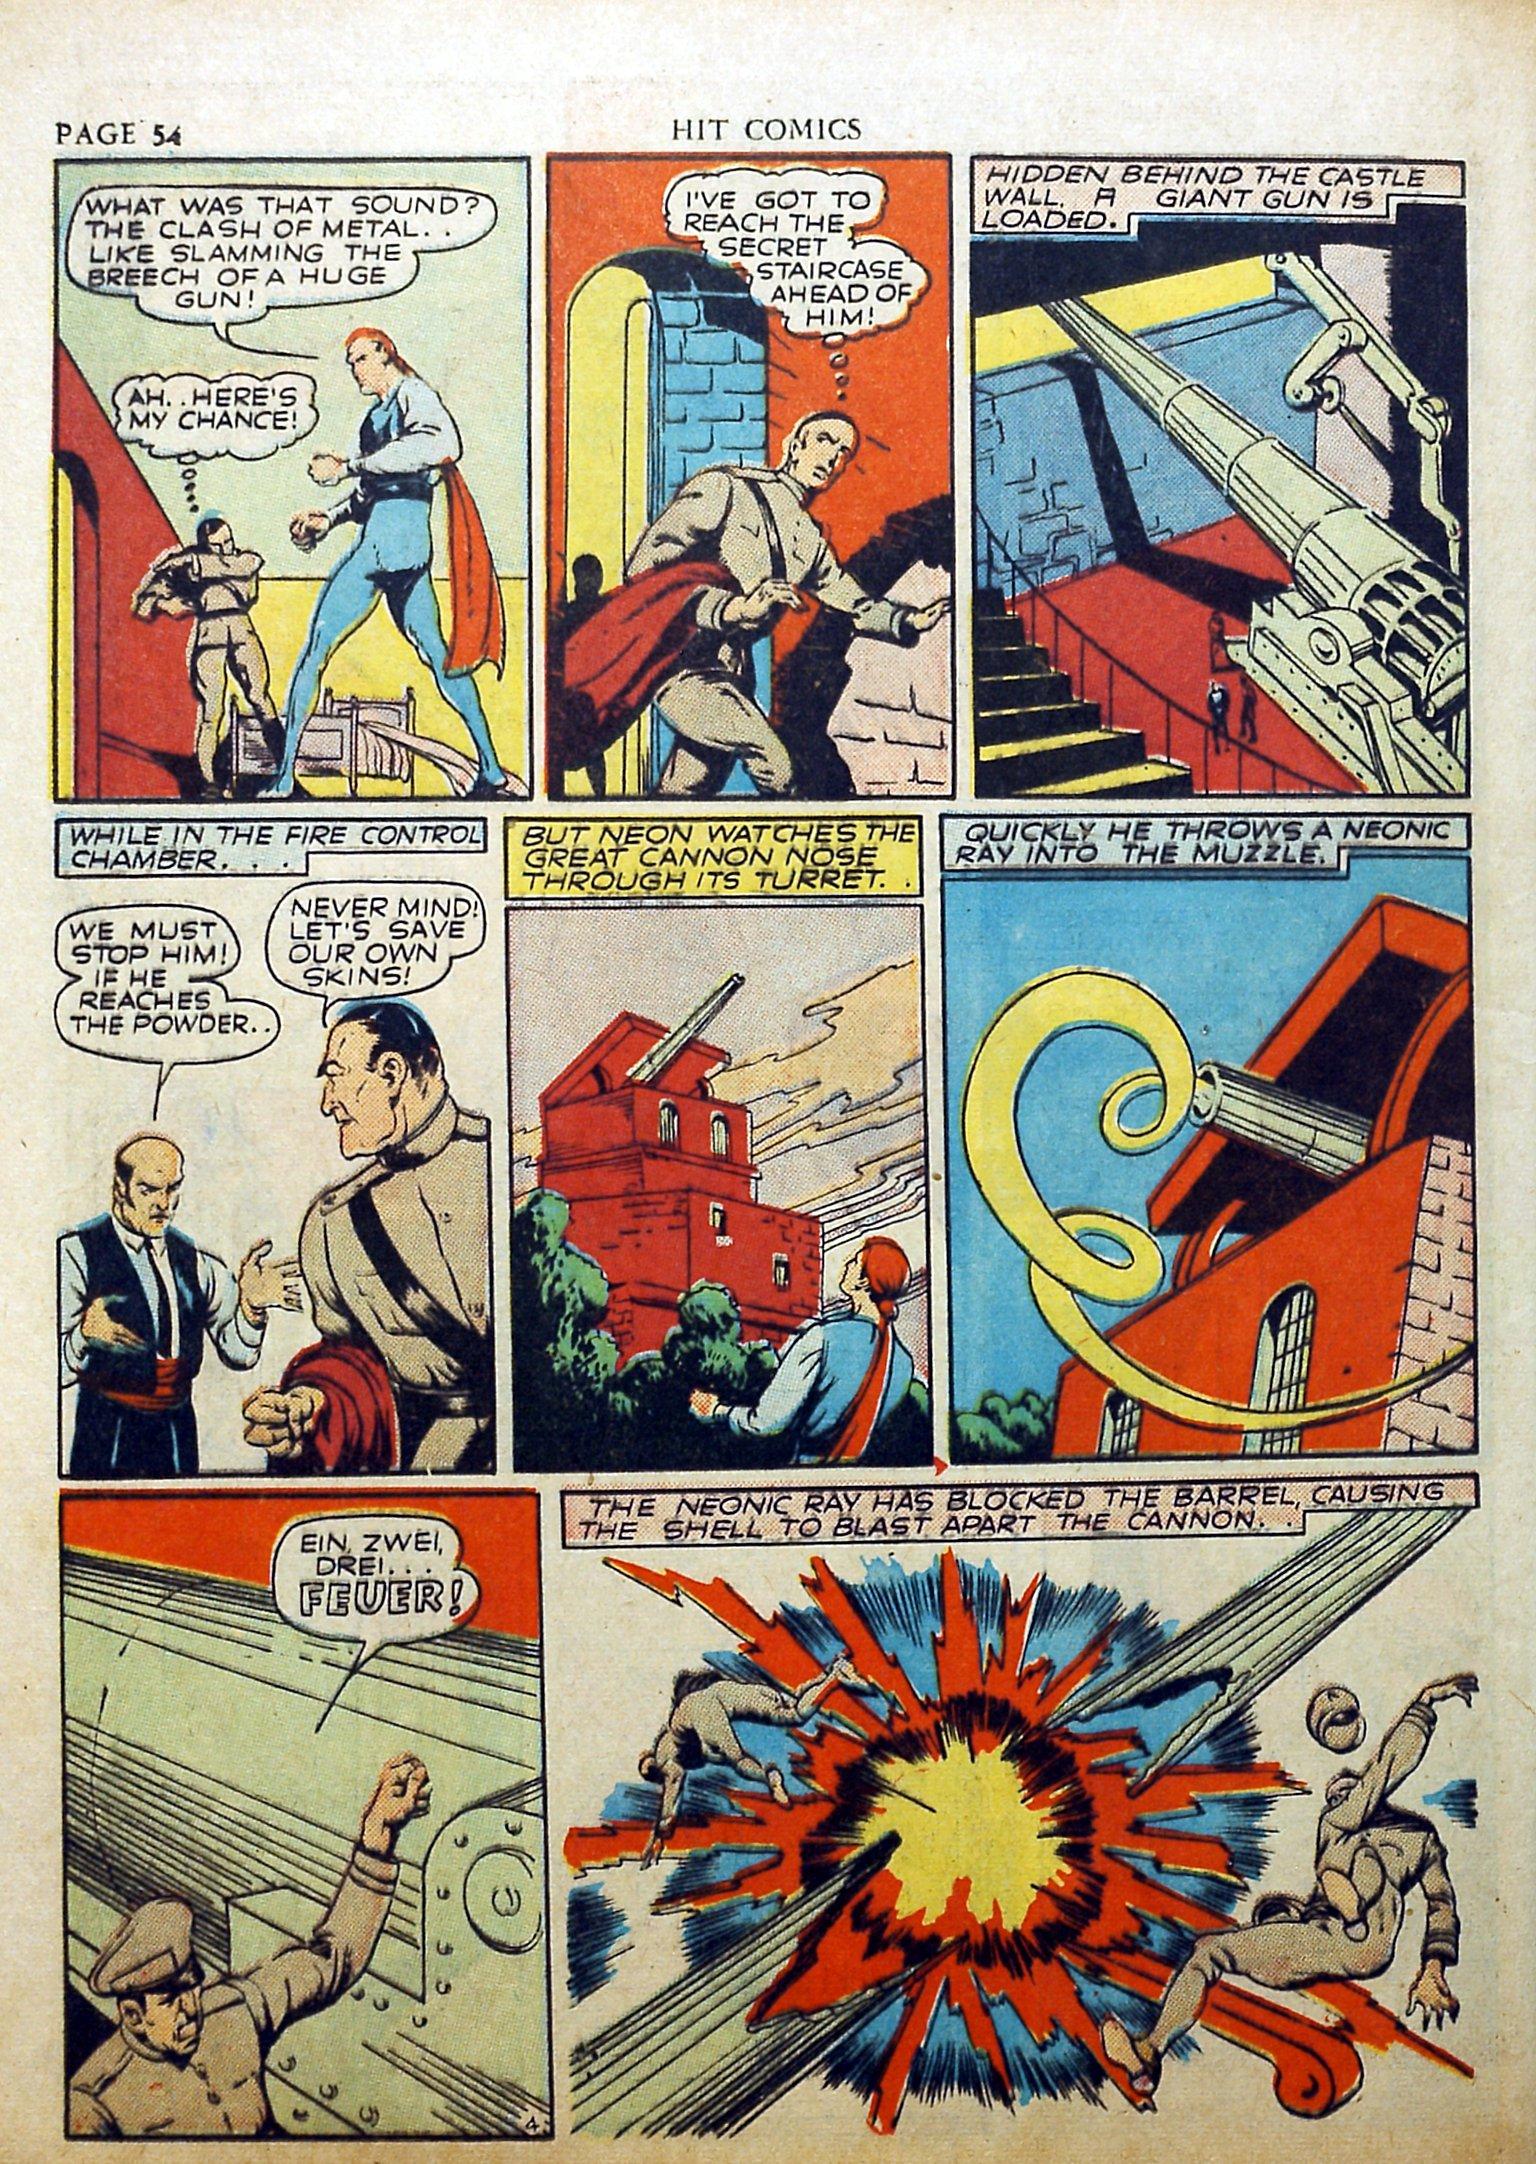 Read online Hit Comics comic -  Issue #17 - 56